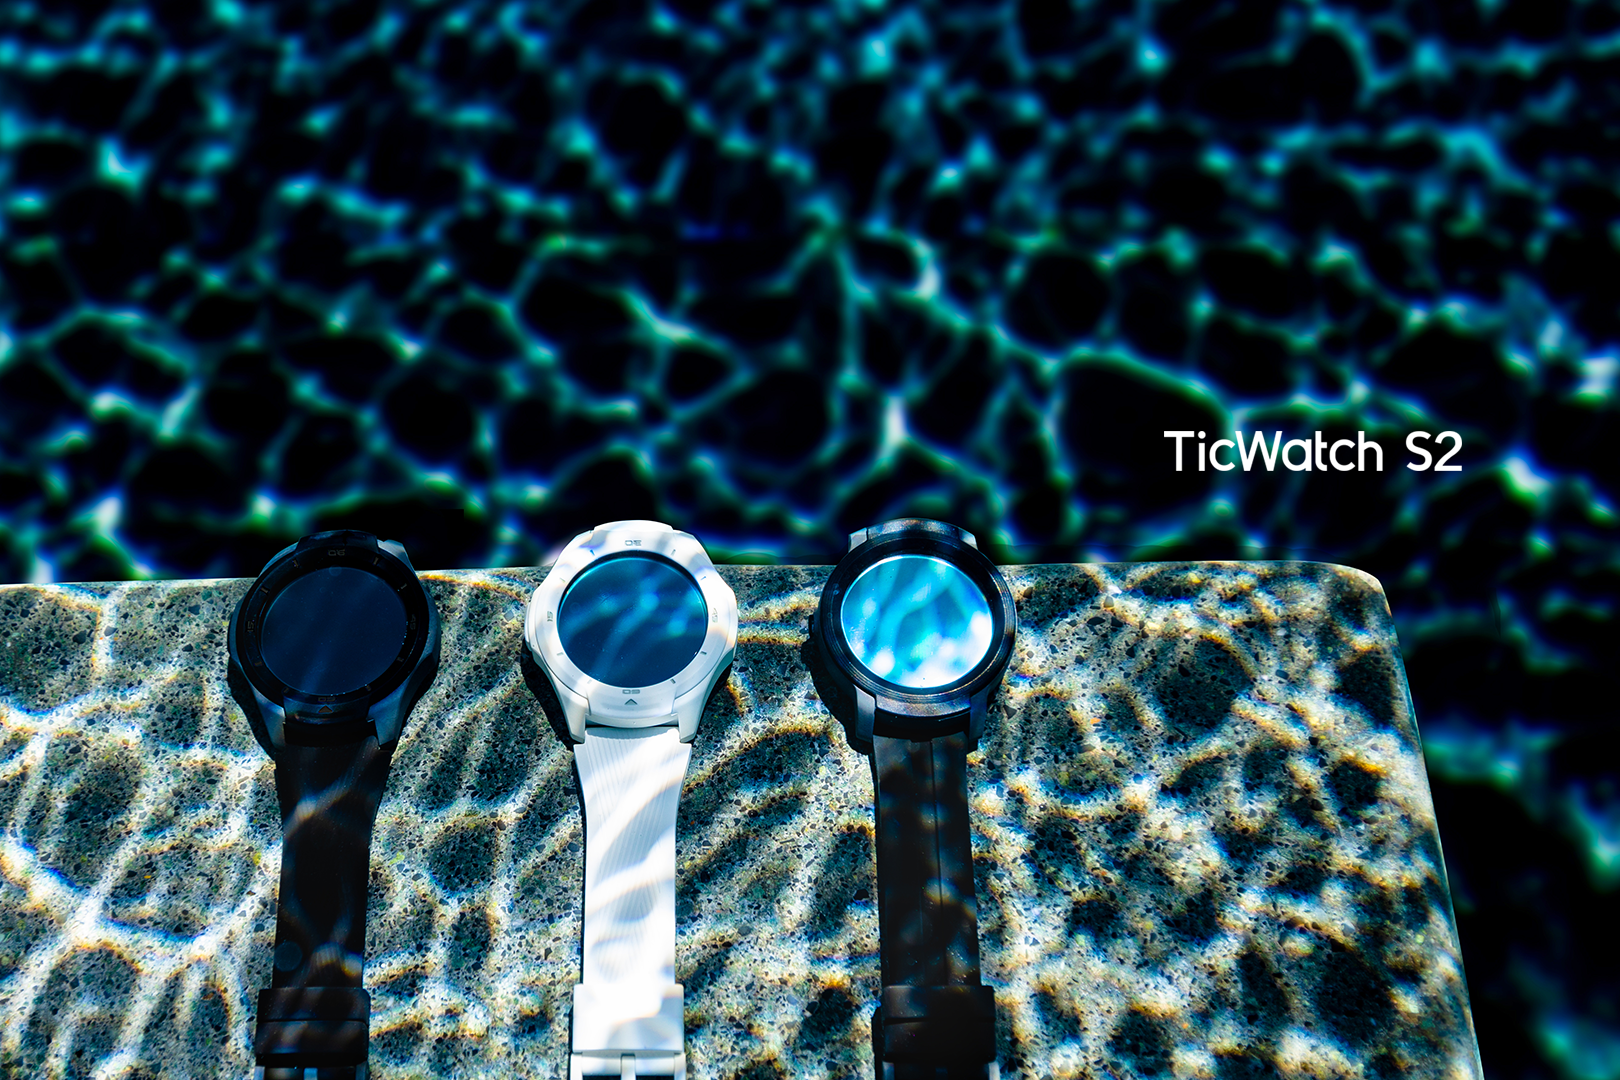 TicWatch-S2-Shao-Jo_LinArtboard-2.png